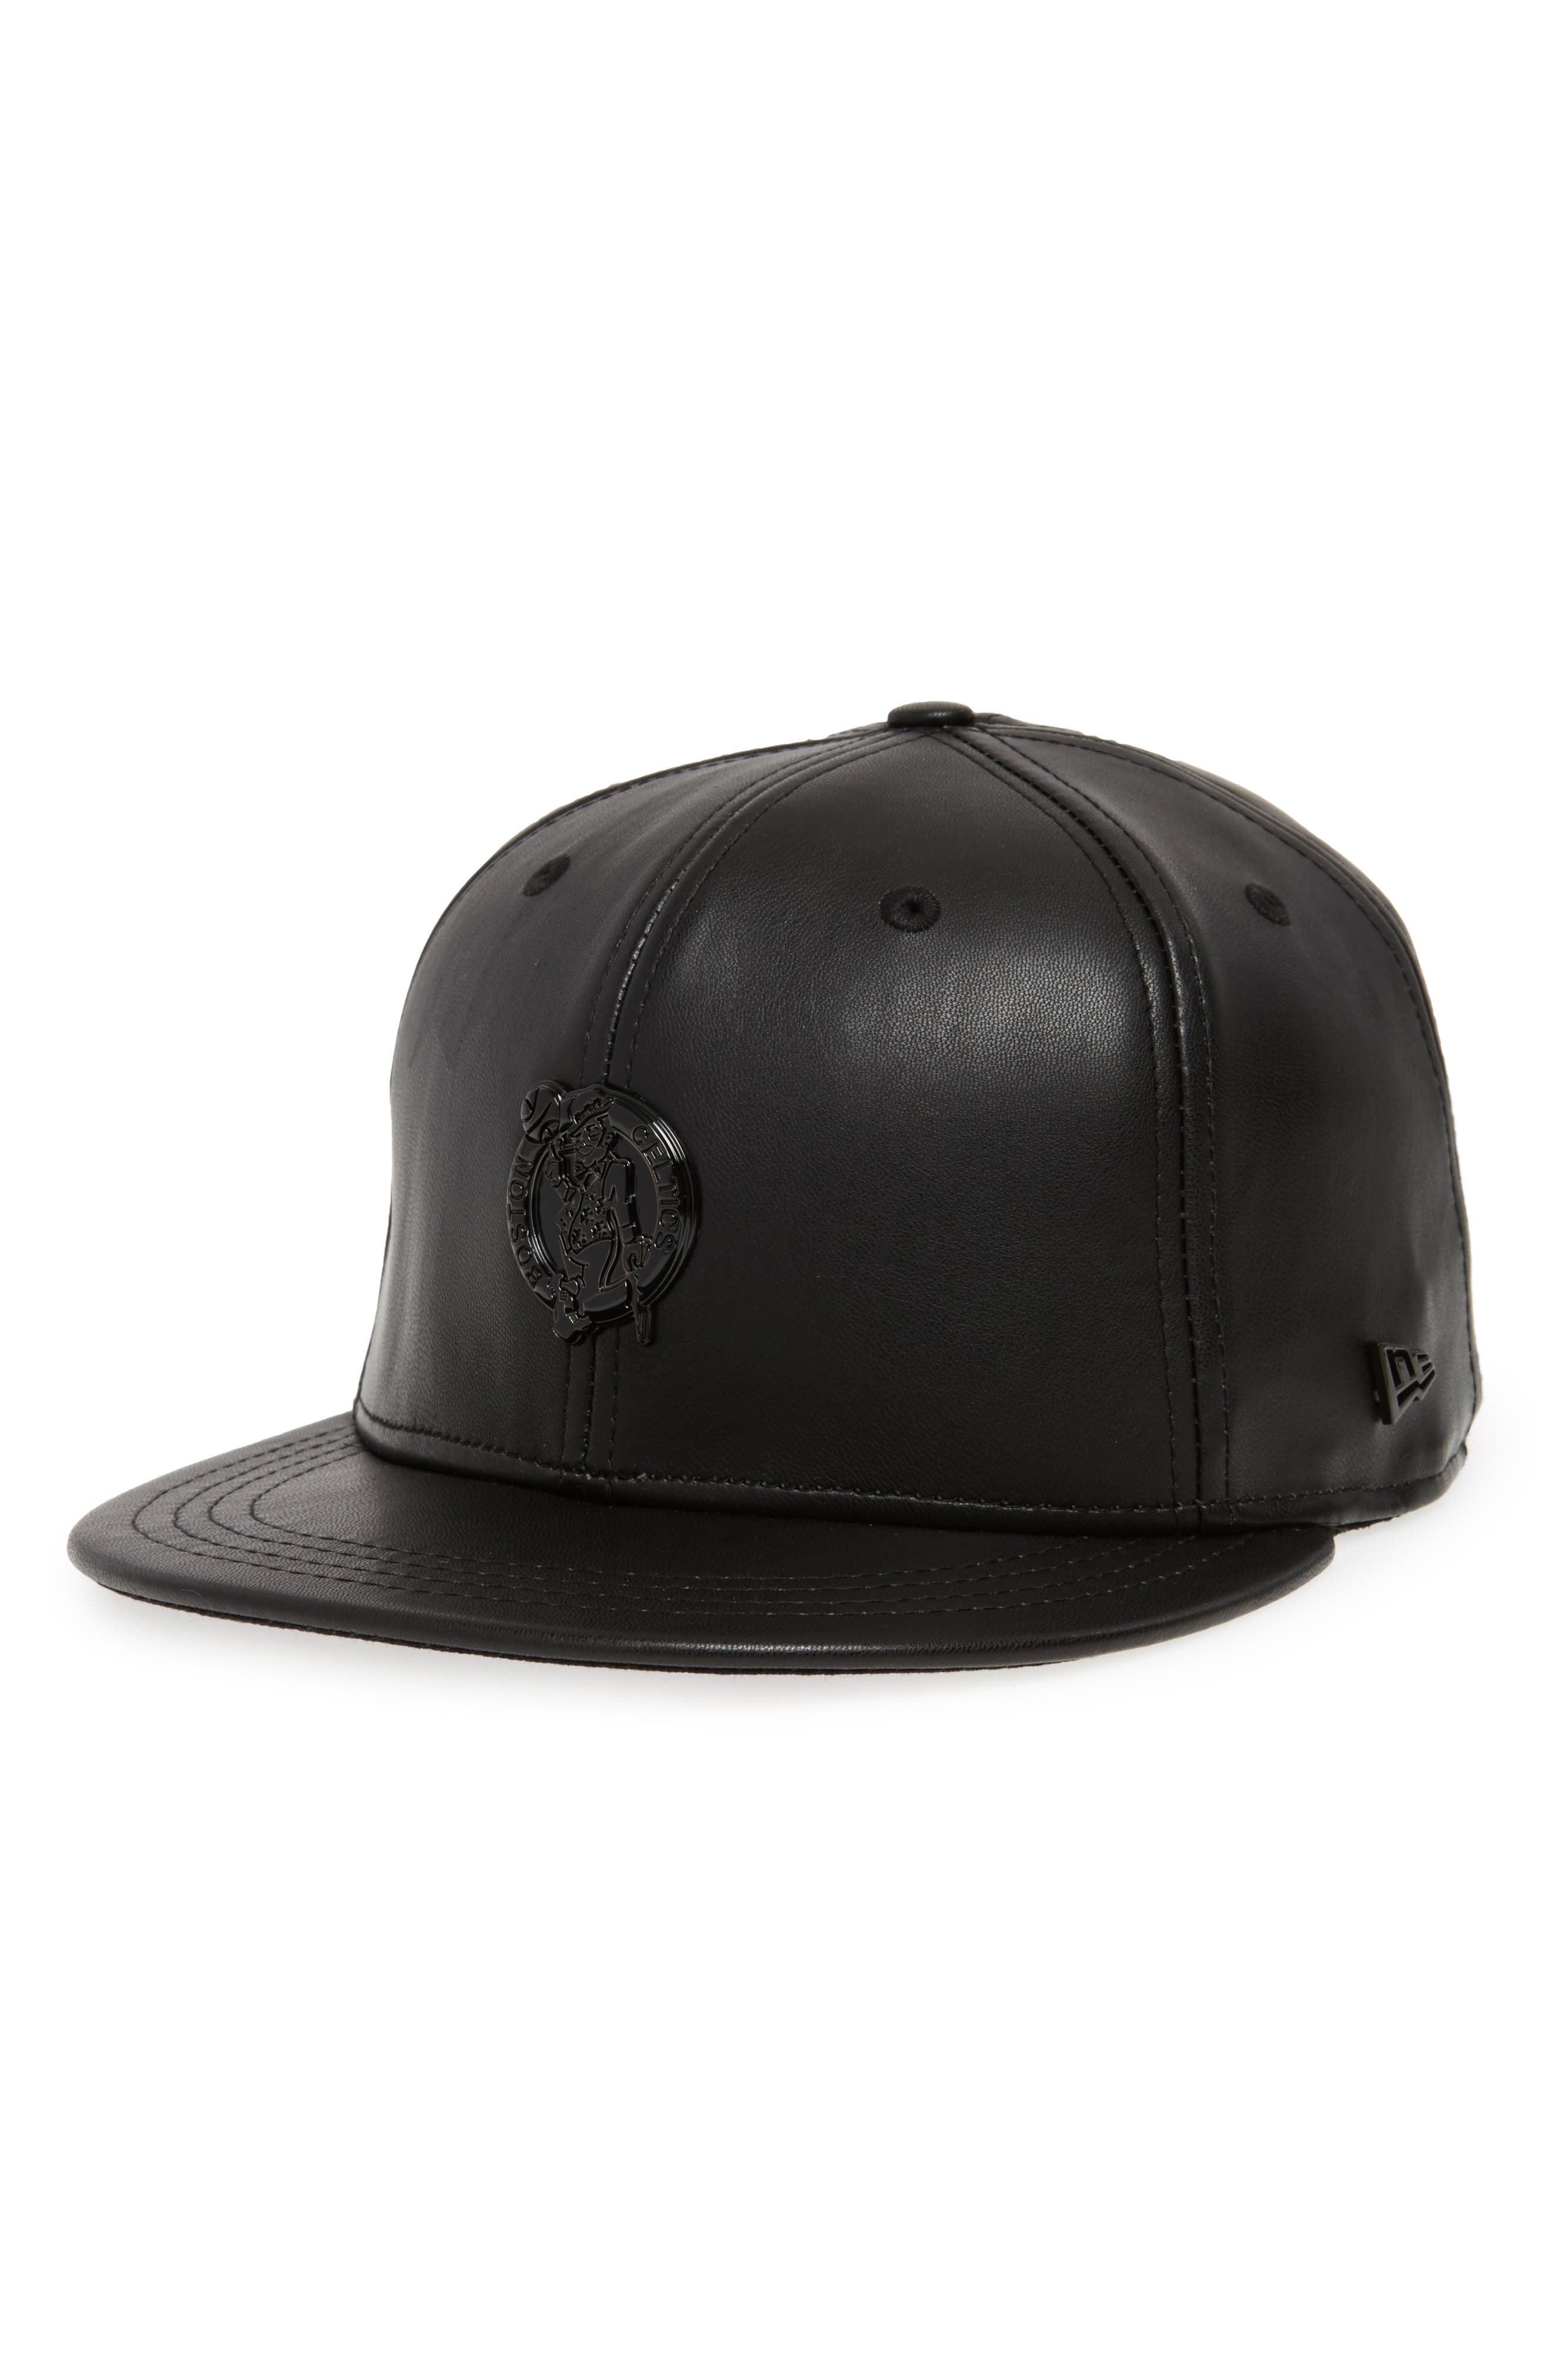 New Era NBA Glossy Faux Leather Snapback Cap